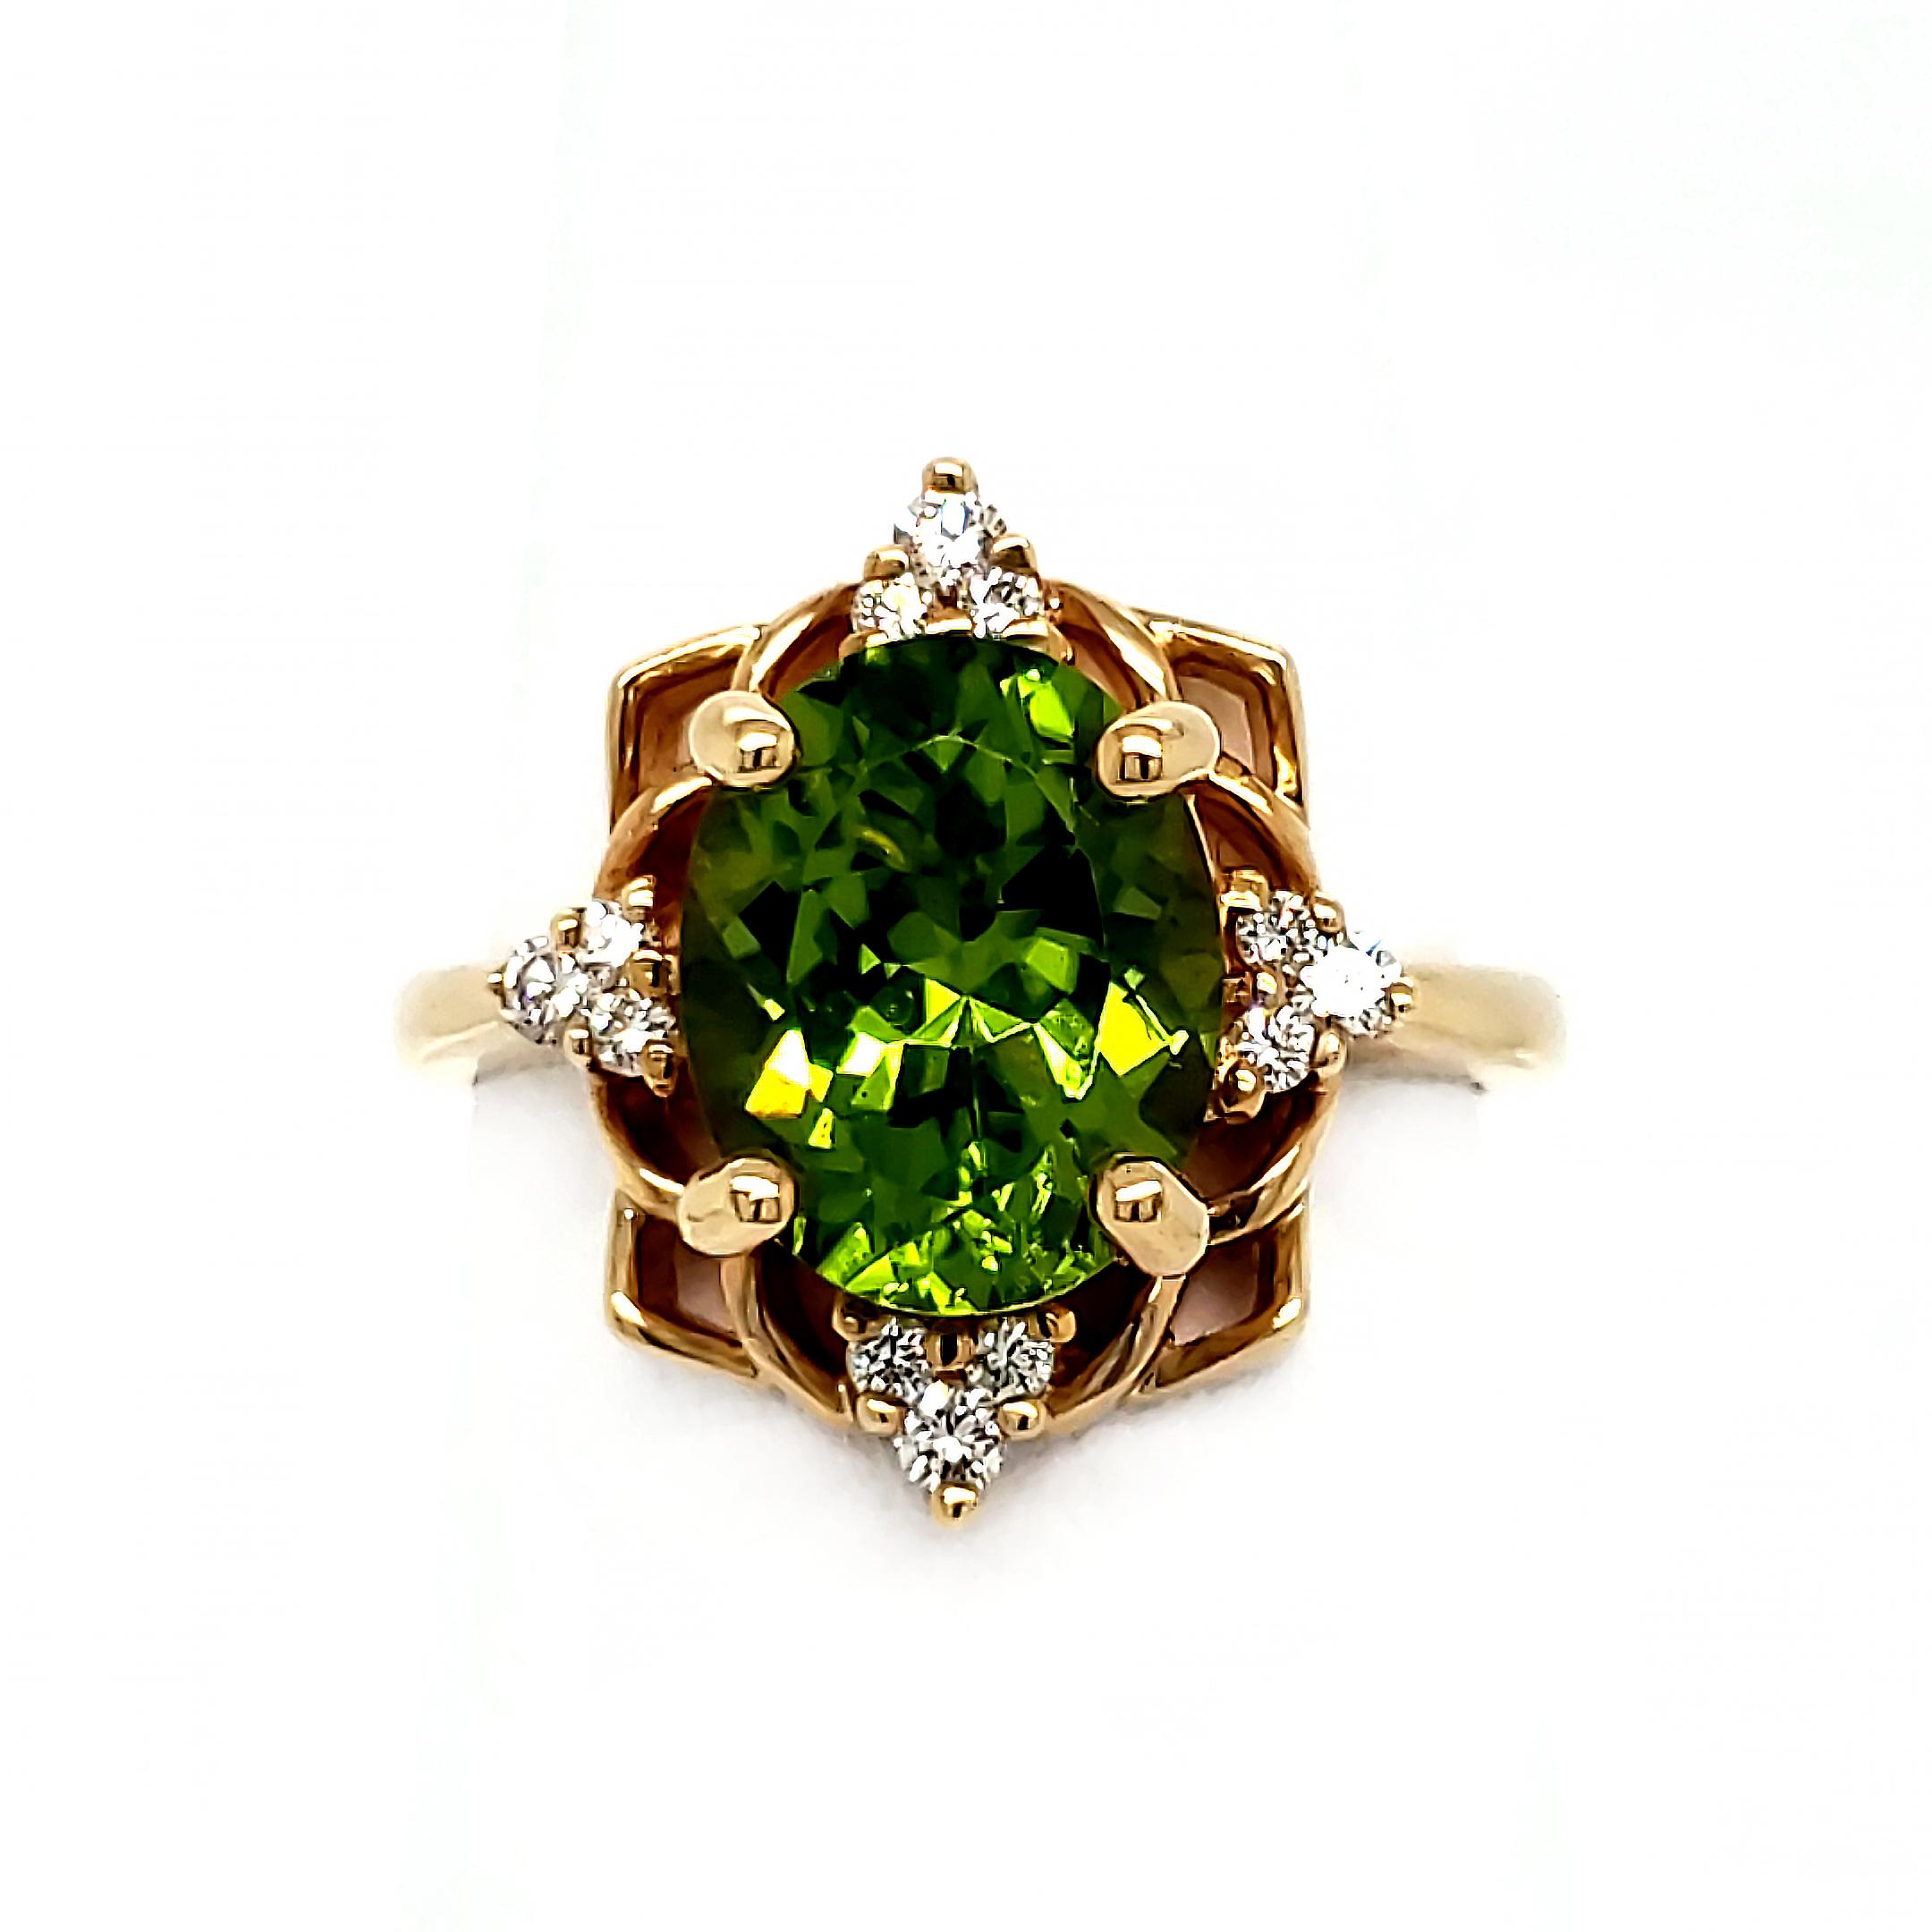 3.15 ct. Arizona Peridot and Diamond 14k Ring